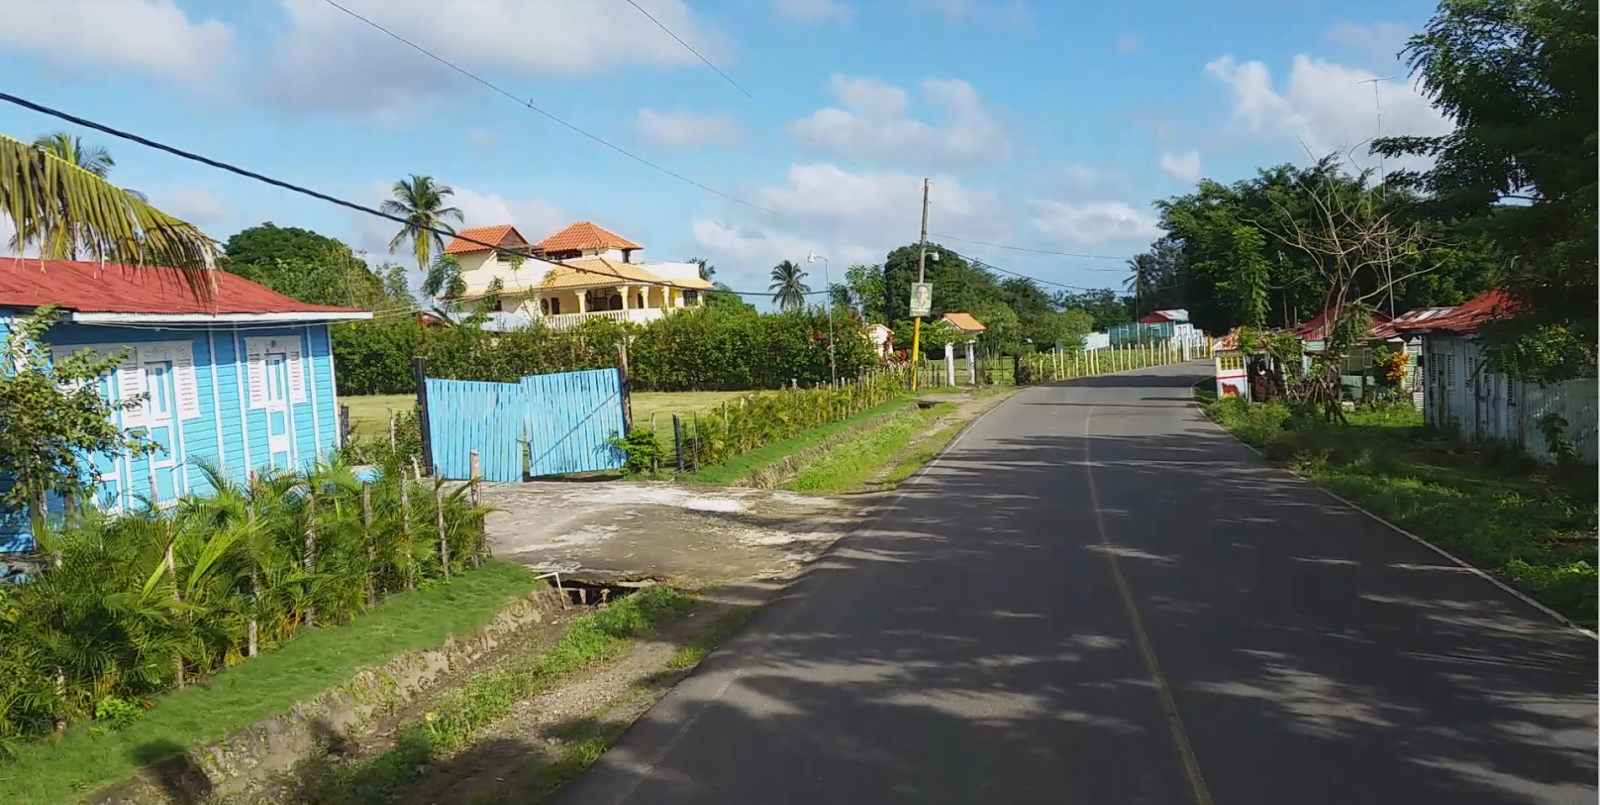 Wioska na Dominikanie